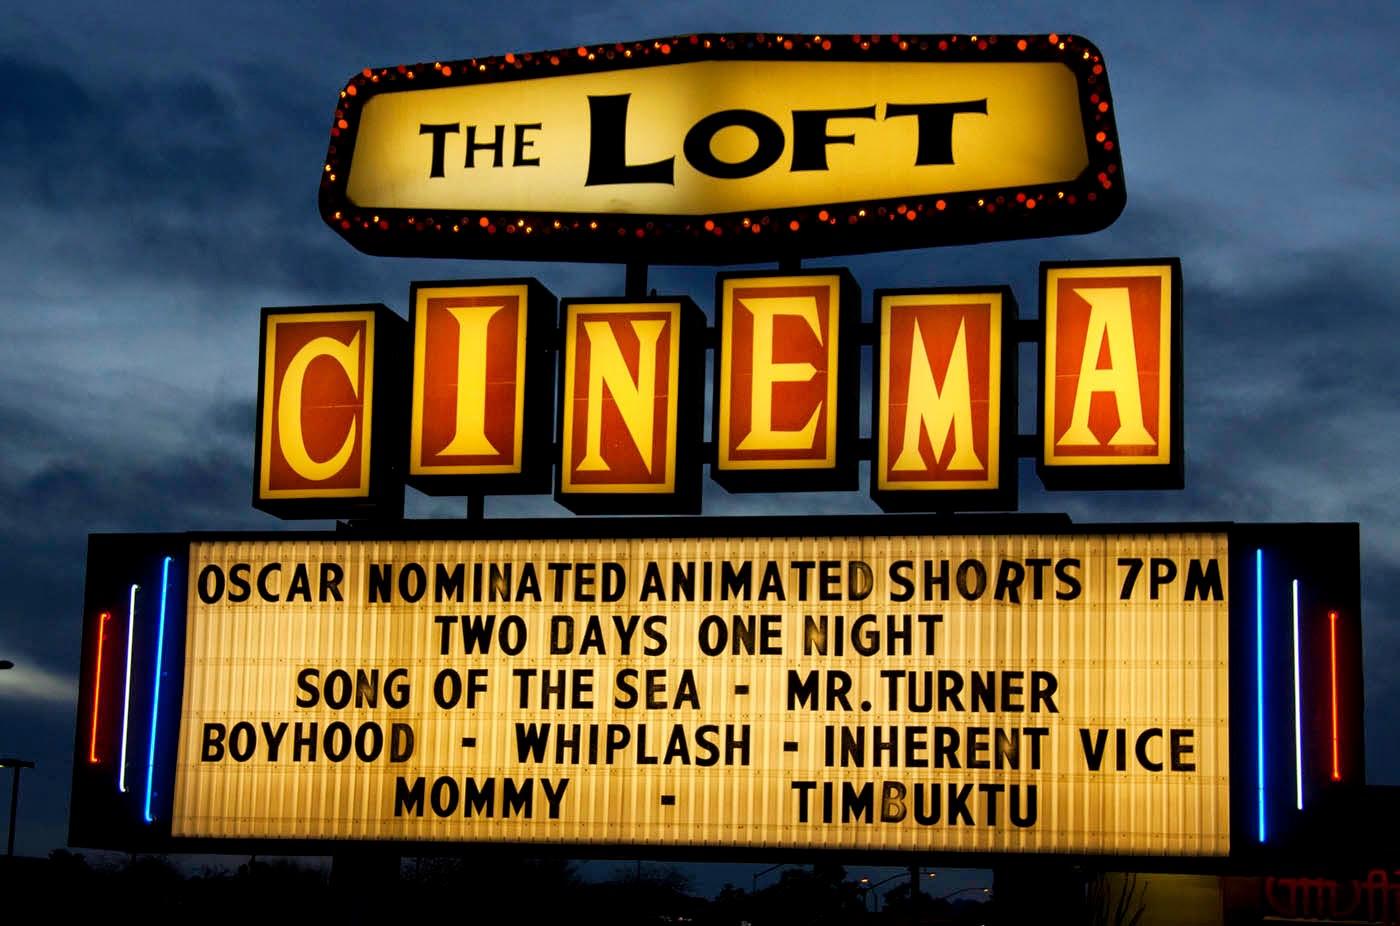 The Loft Cinema Theater Deconstruction Timelapse (no audio